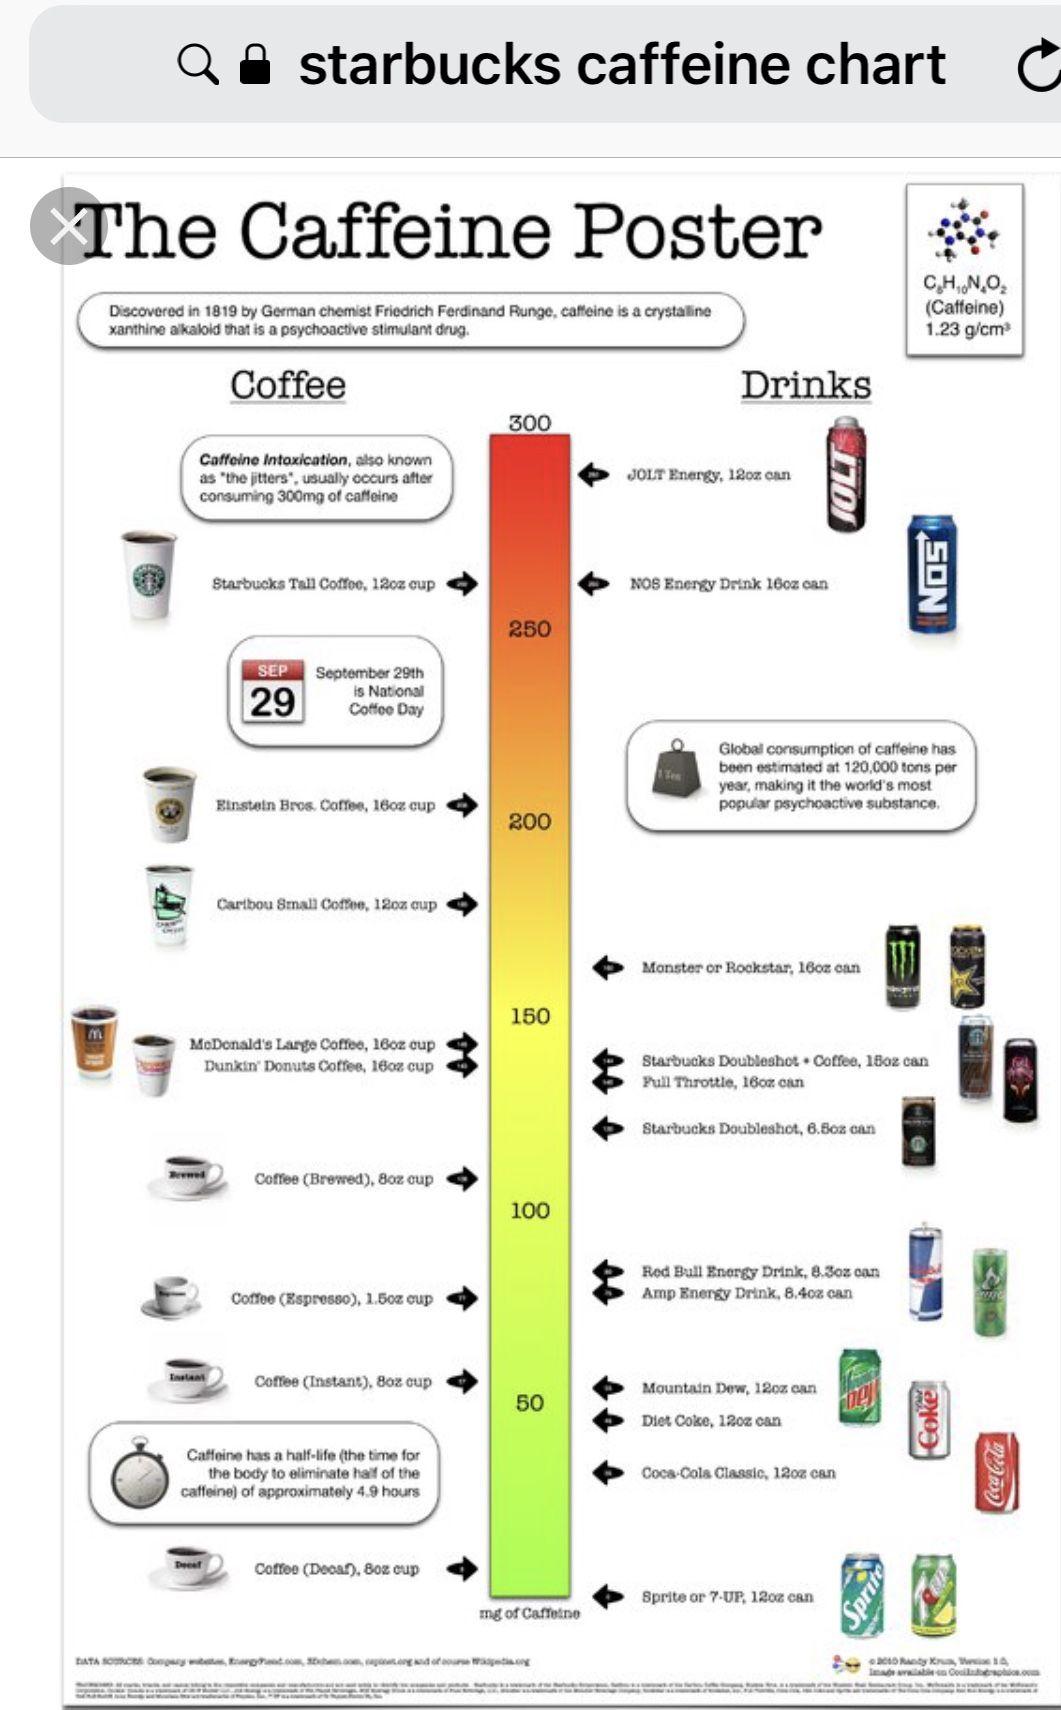 Starbucks Caffeine Chart Nutrition infographic, Energy